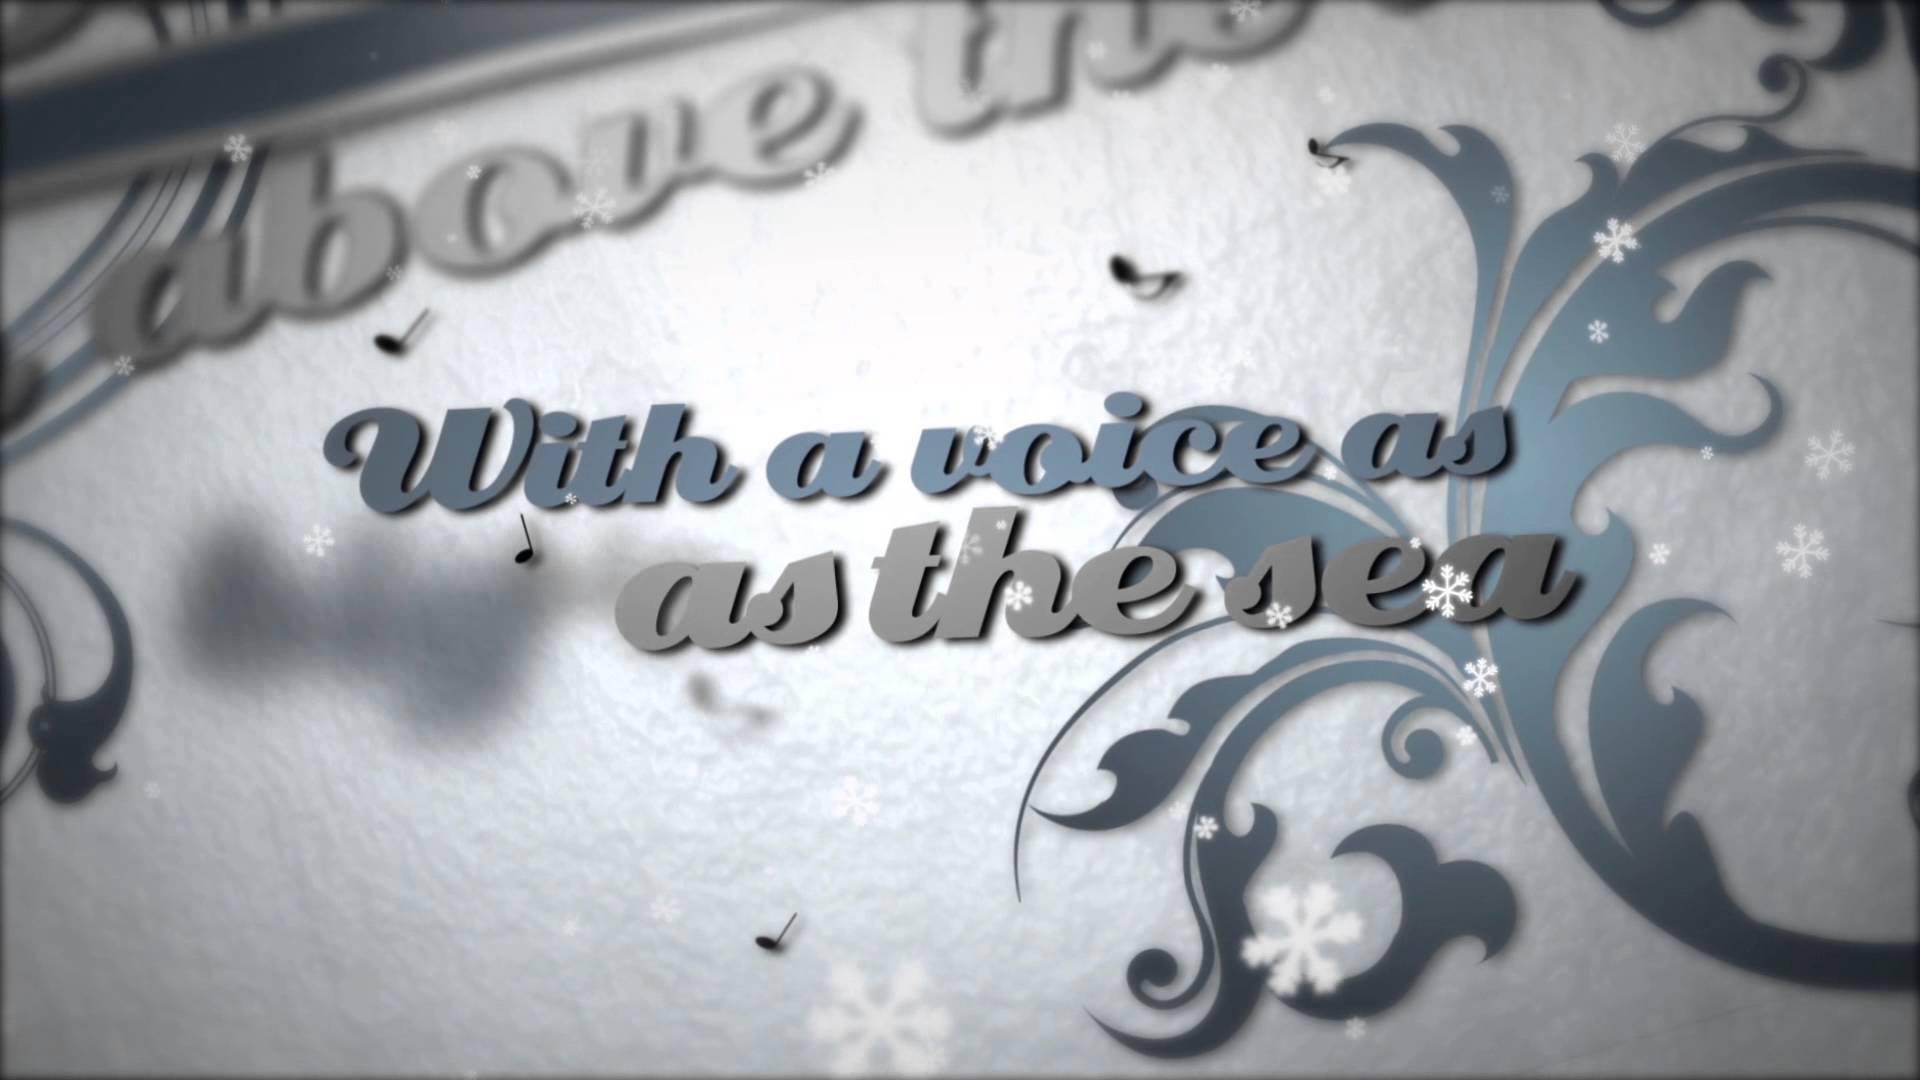 William Beckett - Do You Hear What I Hear (Lyric Video)